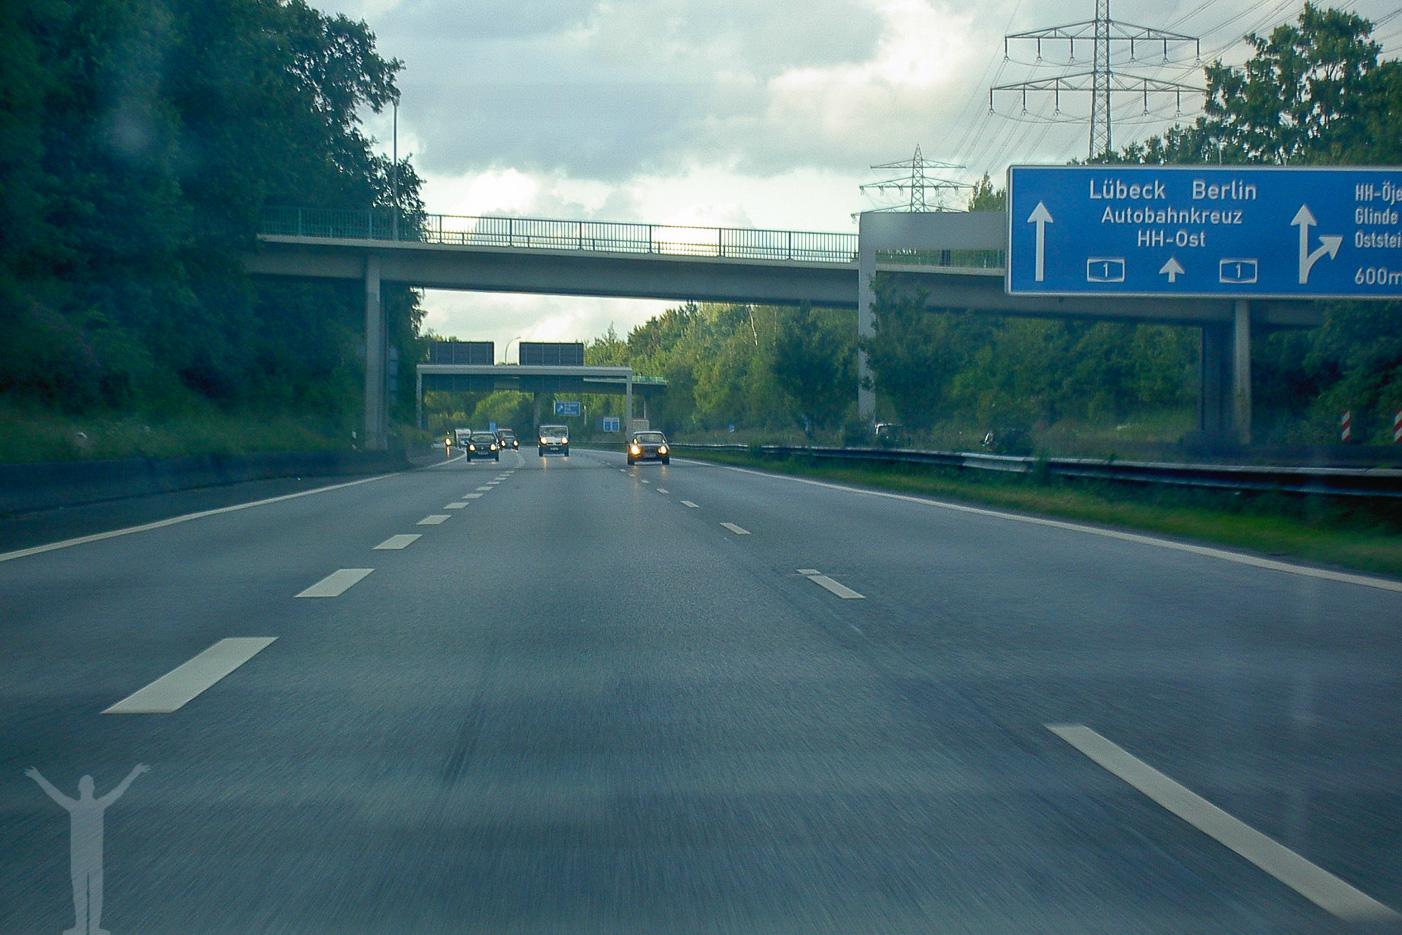 Autobahn genom Tyskland